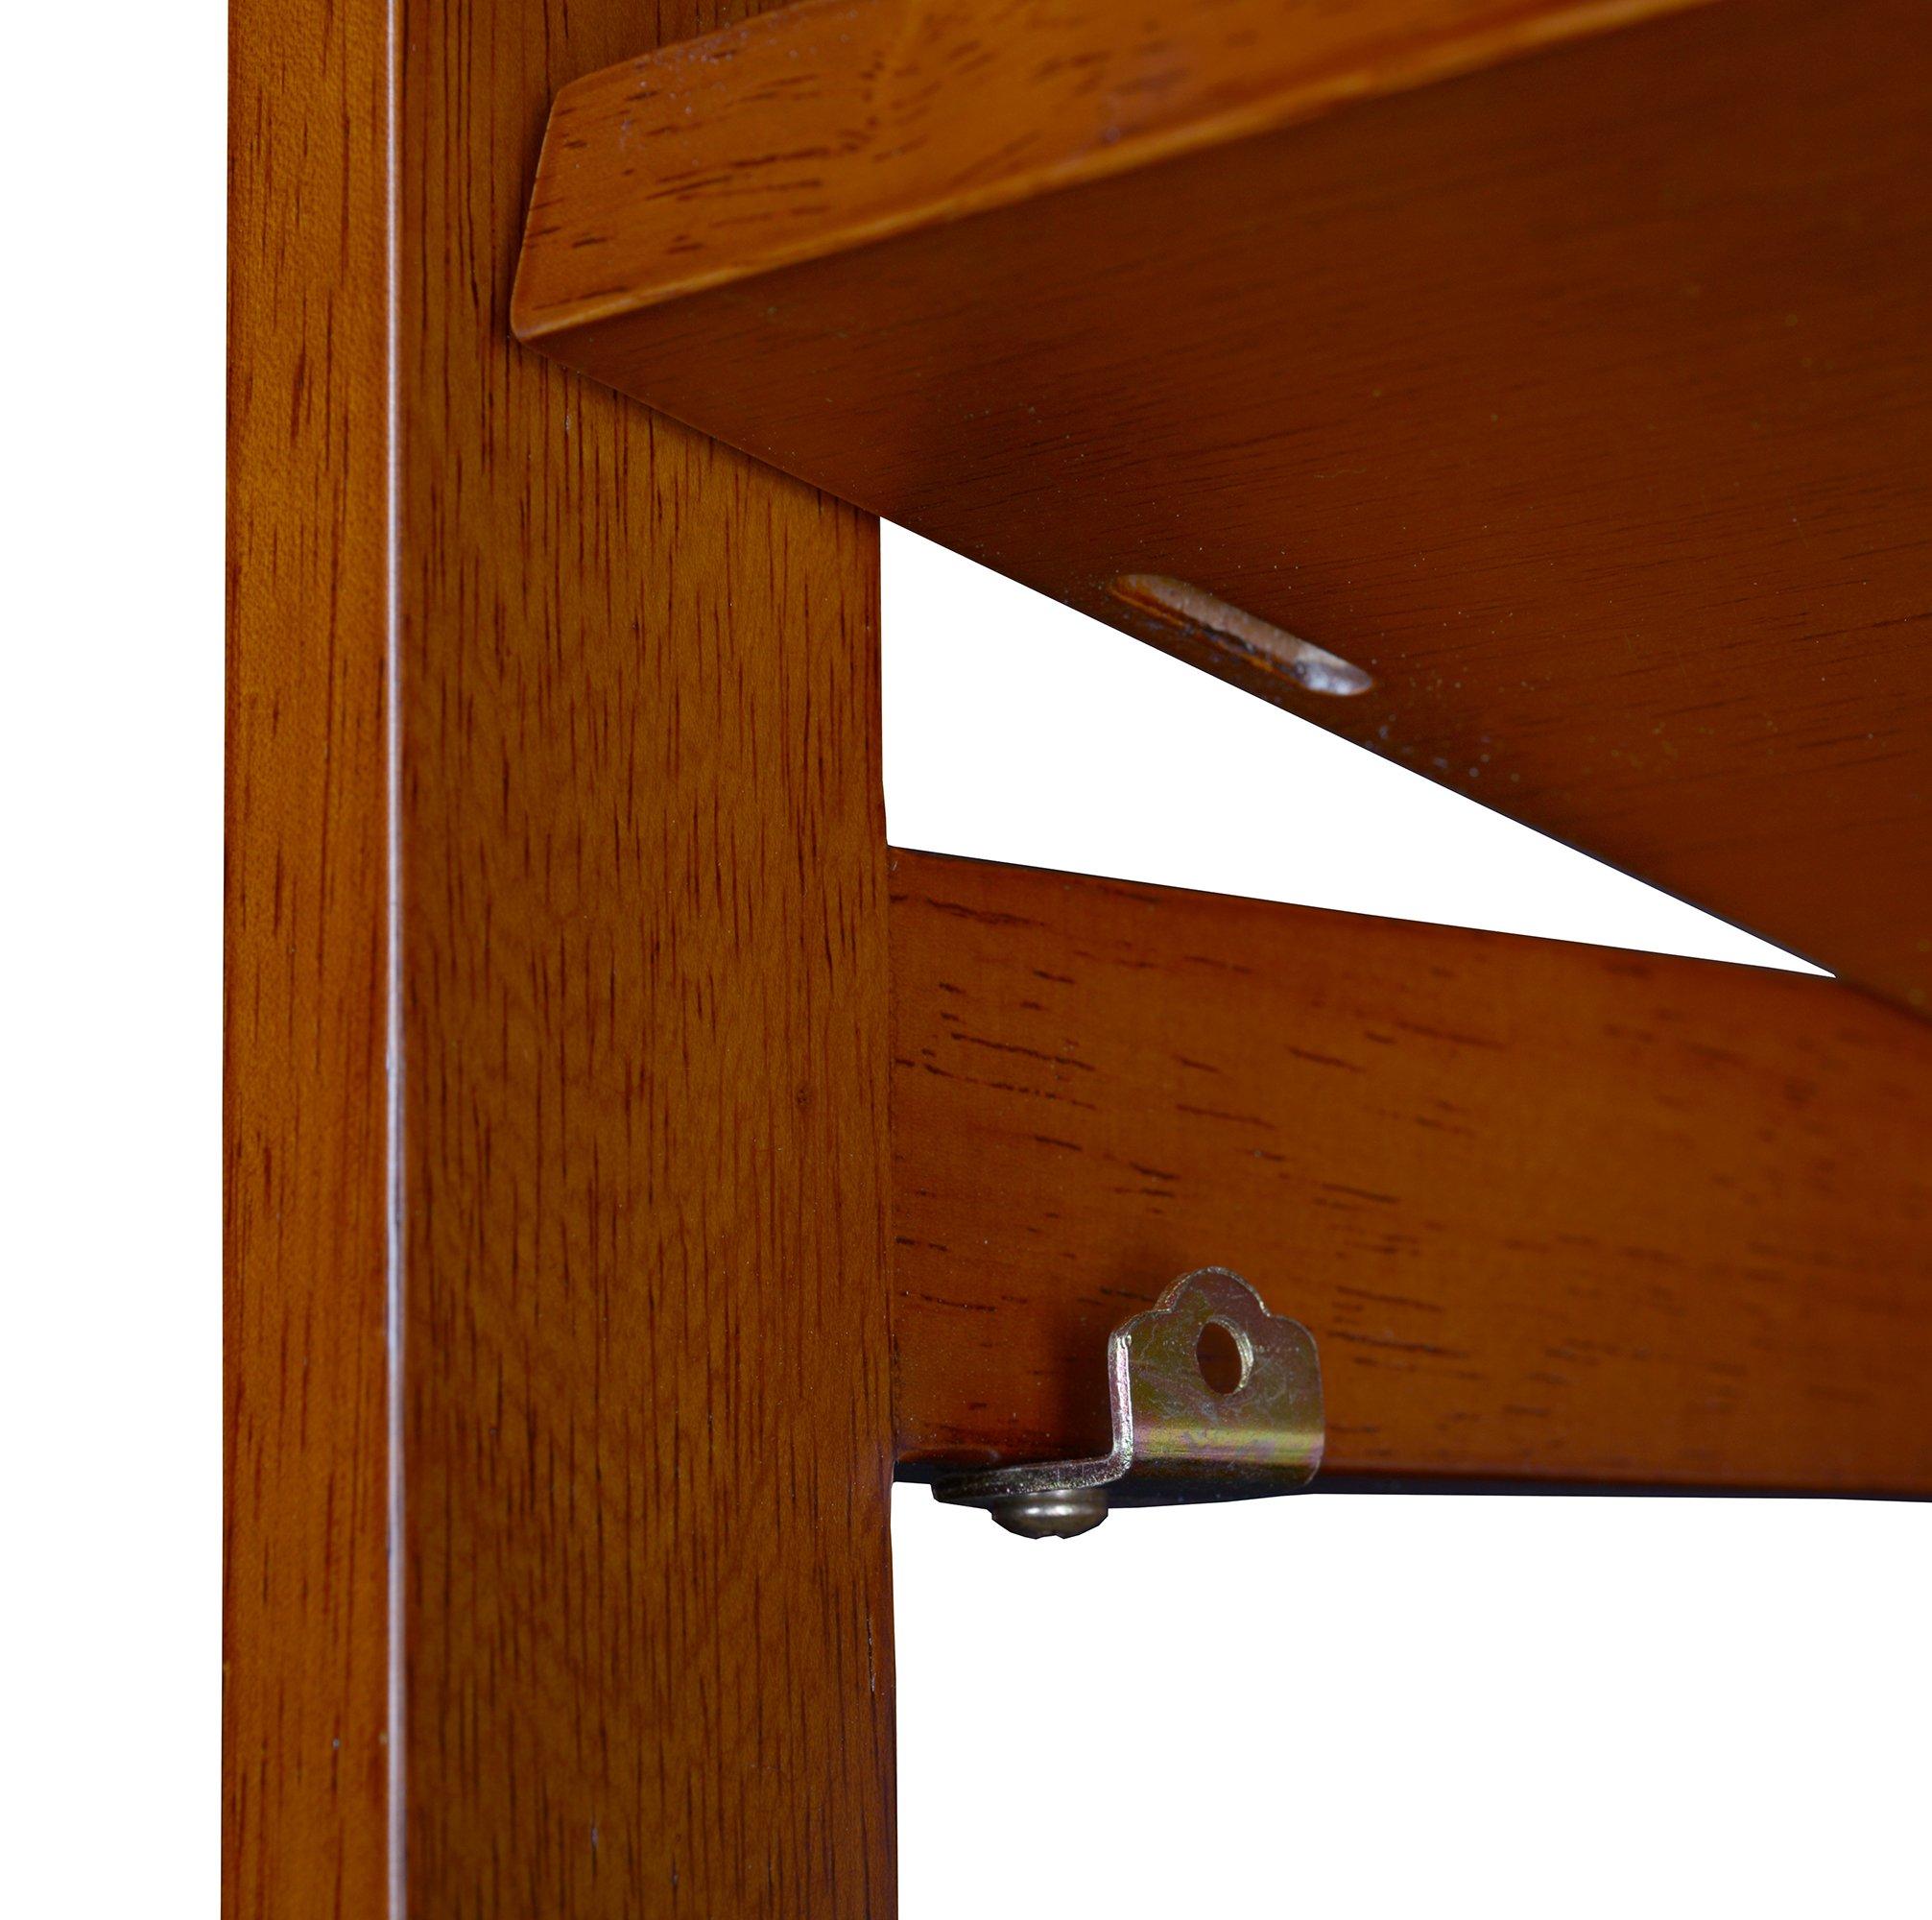 Regency Flip Flop 34-inch High Corner Folding Bookcase- Cherry by Regency (Image #6)